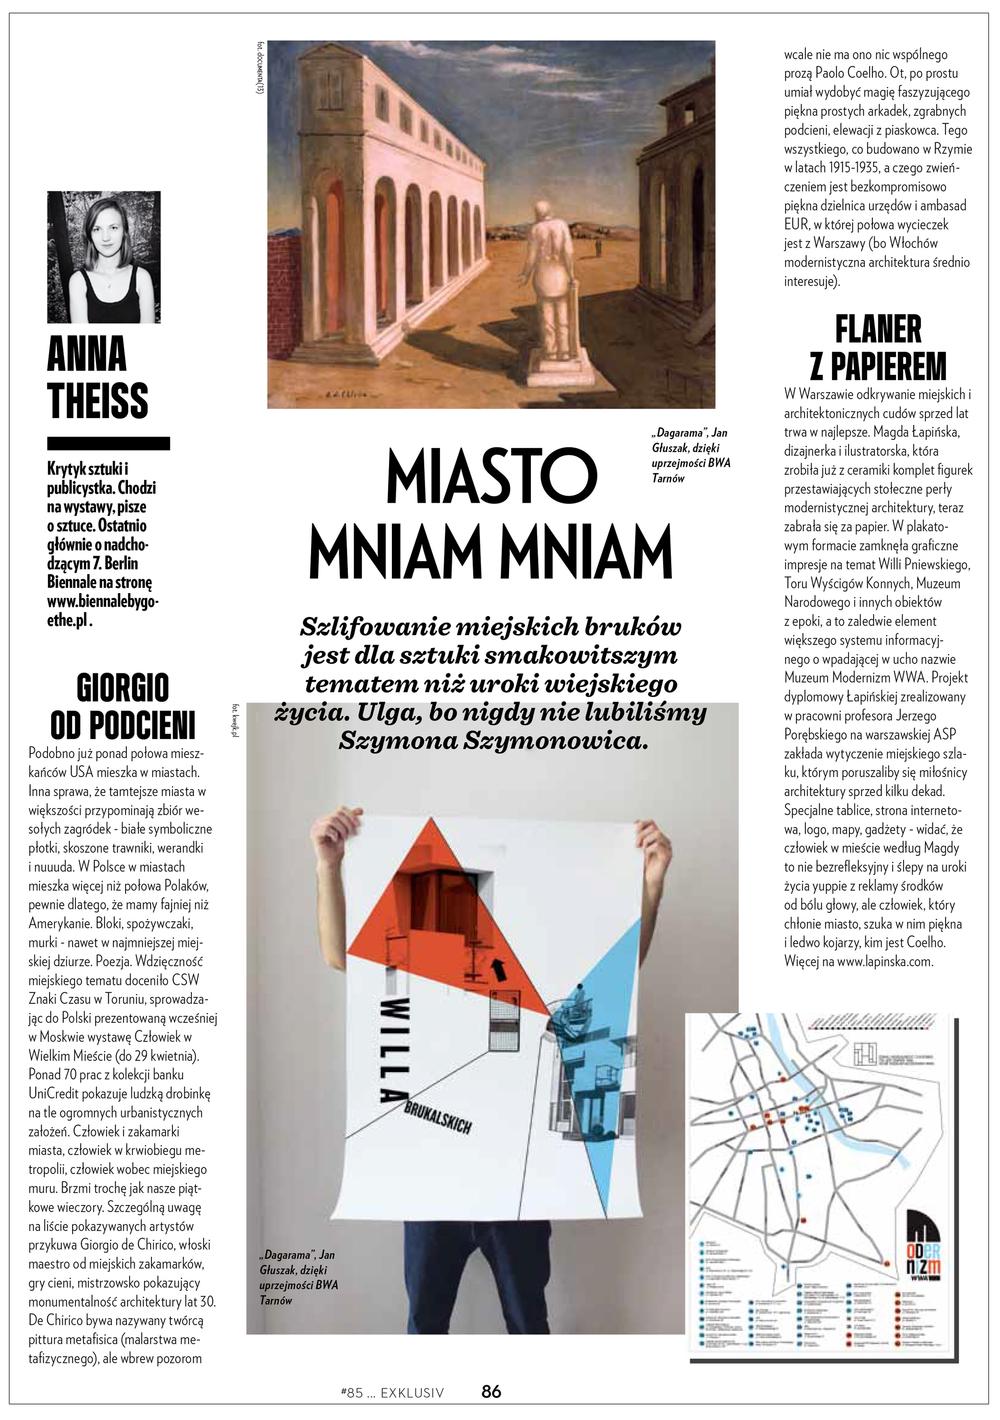 Exklusiv magazine, 2011